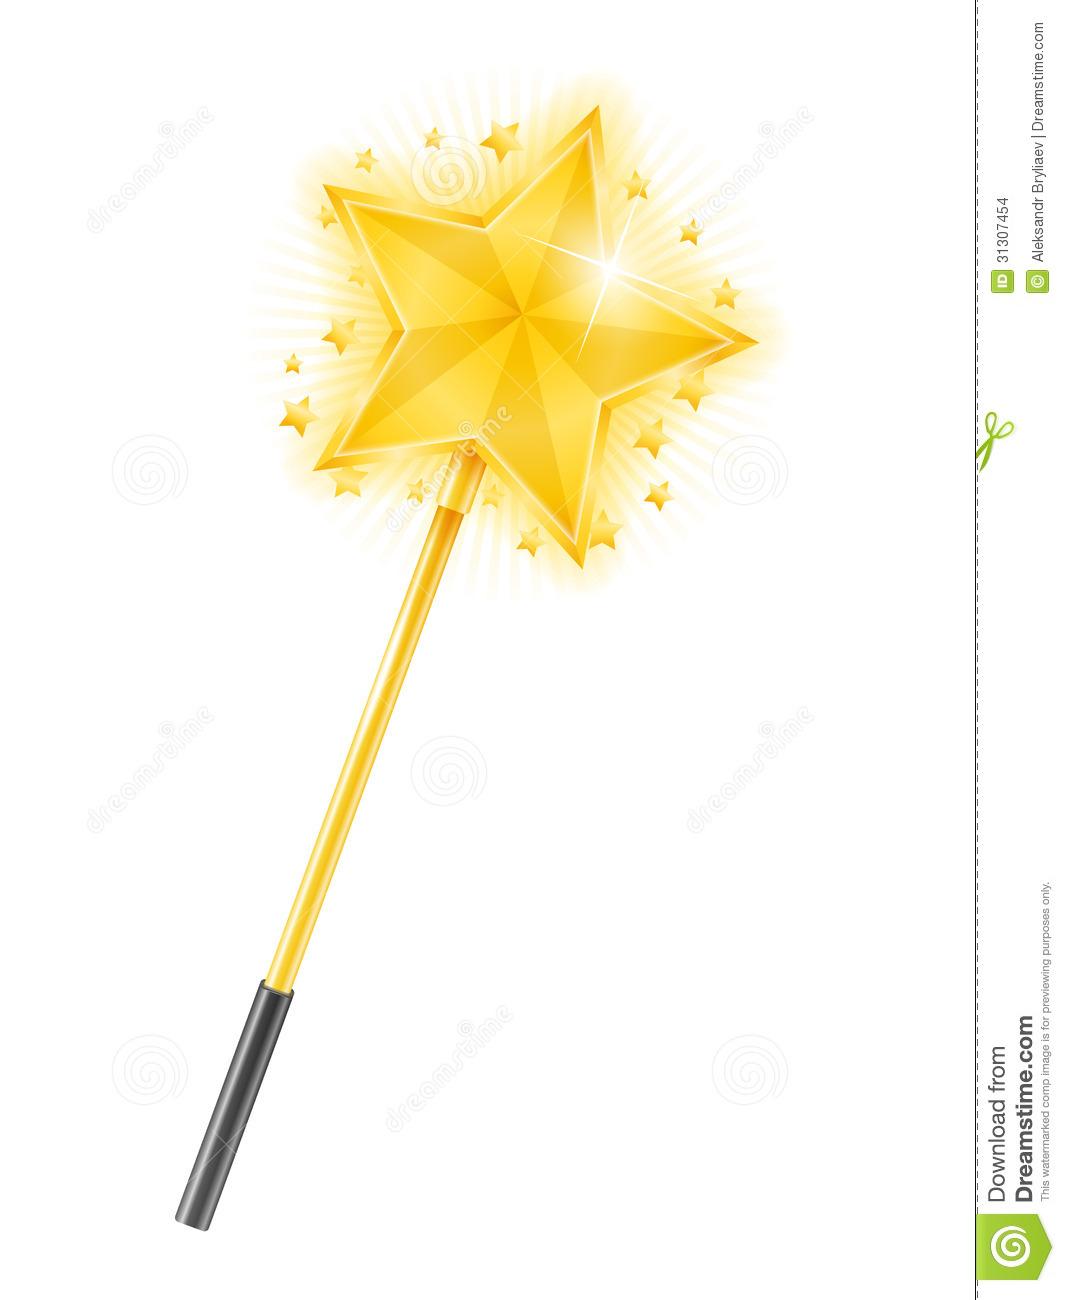 1065x1300 Star Clipart Magic Wand